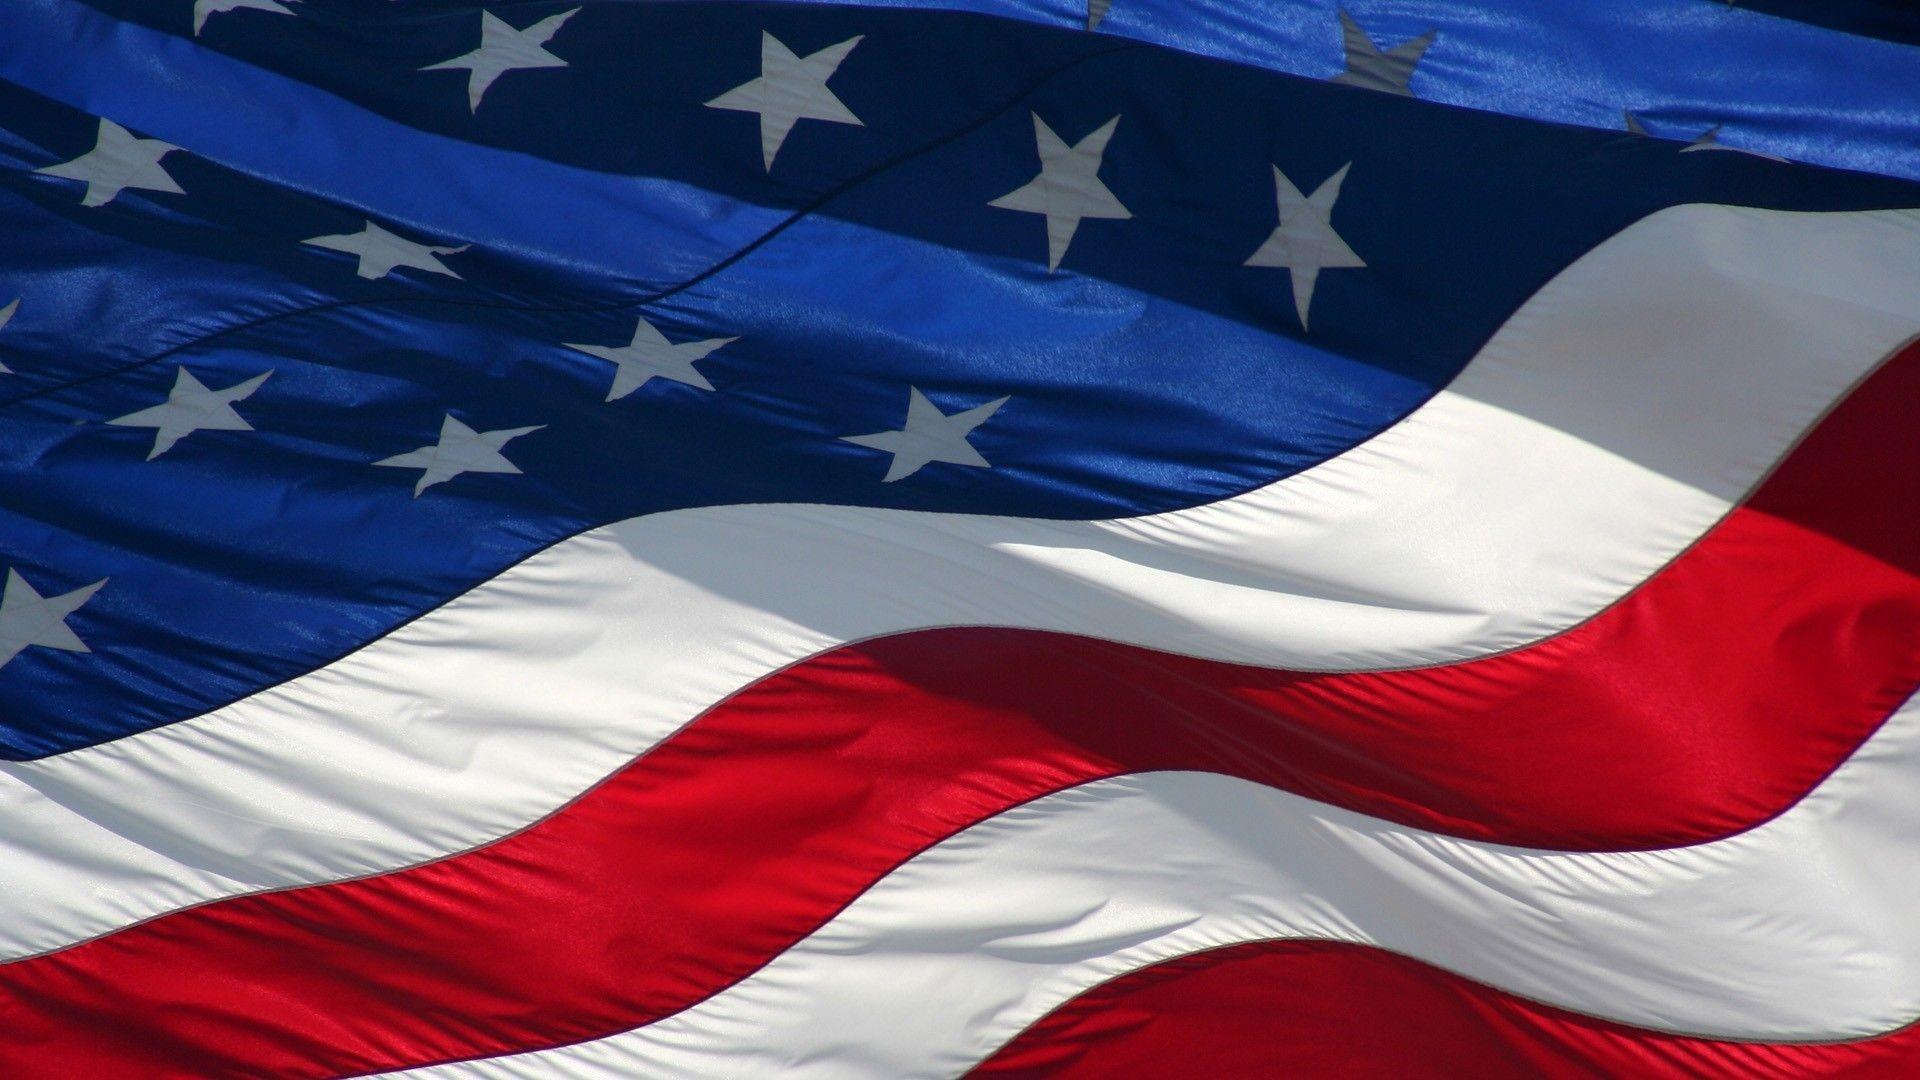 American Flag Desktop Backgrounds · American Flag Desktop Backgrounds free  powerpoint background